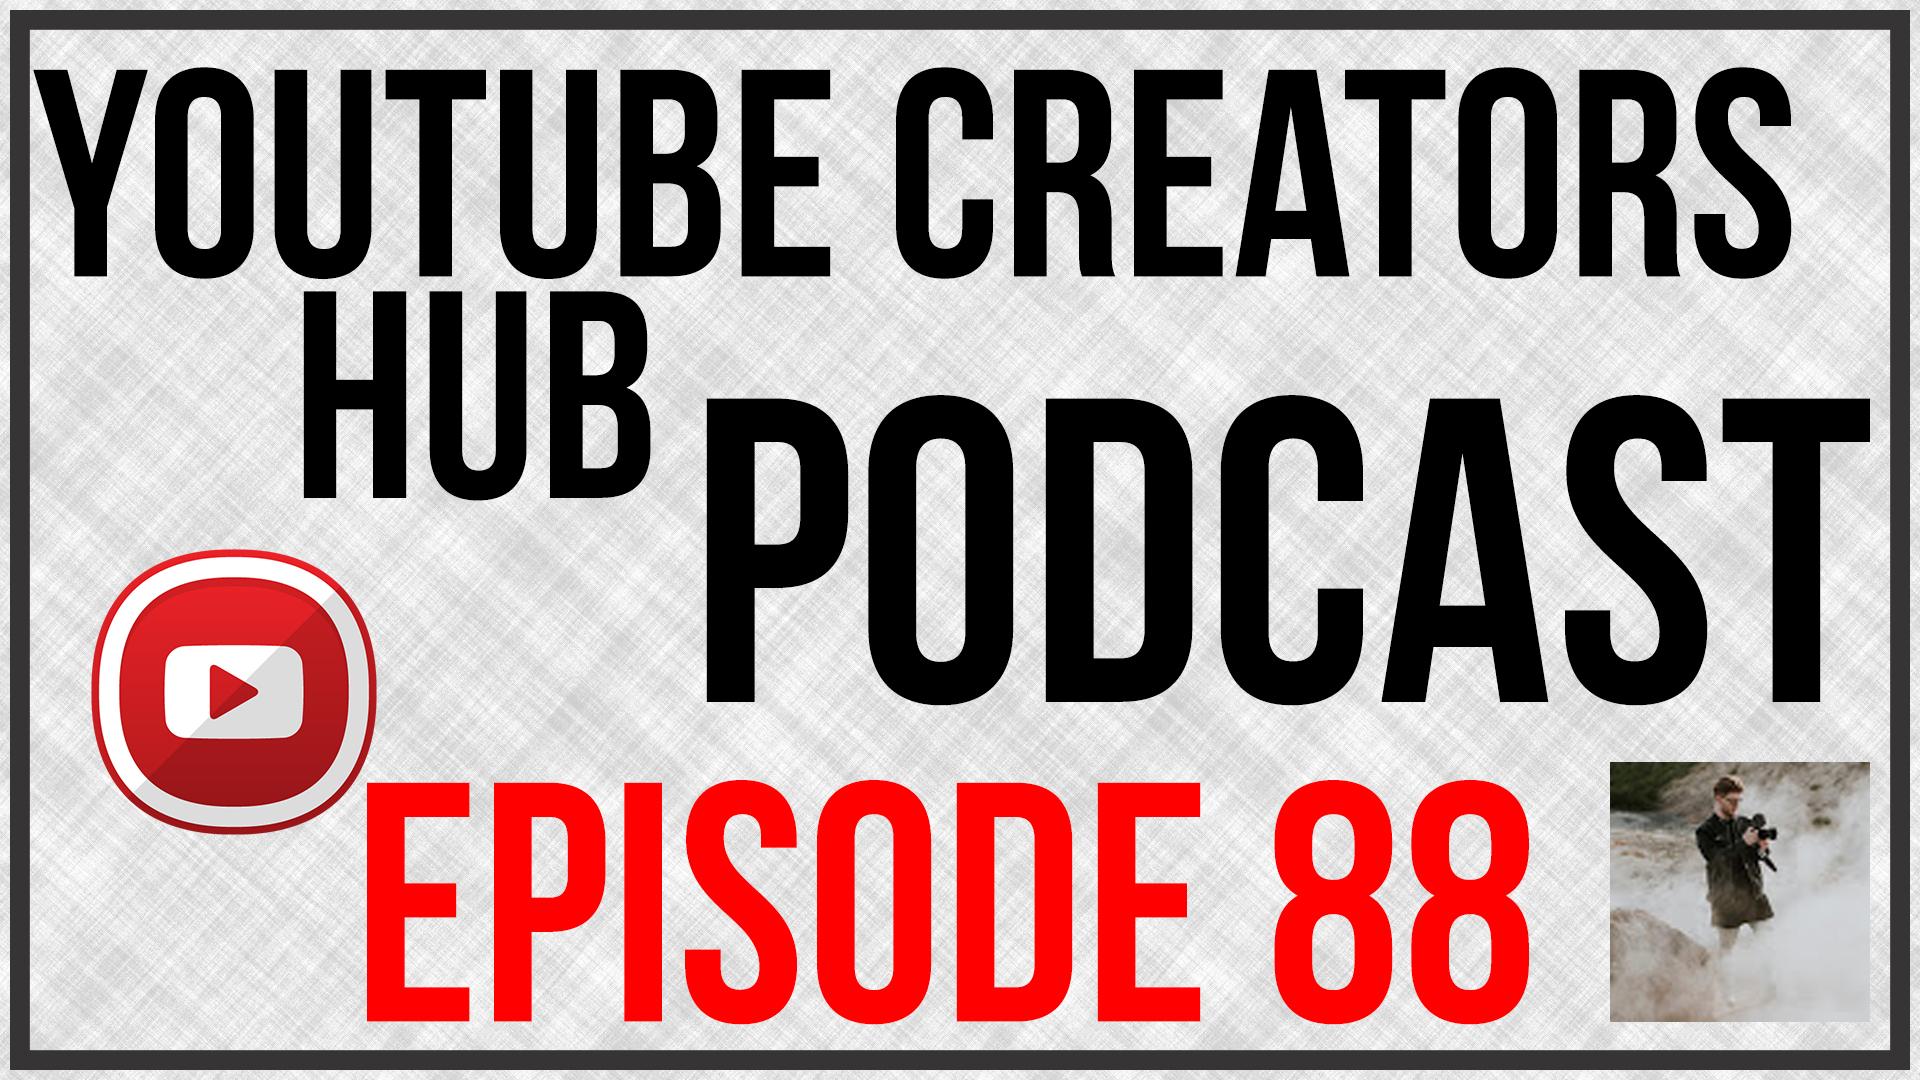 YouTube Creators Hub Podcast Episode 88